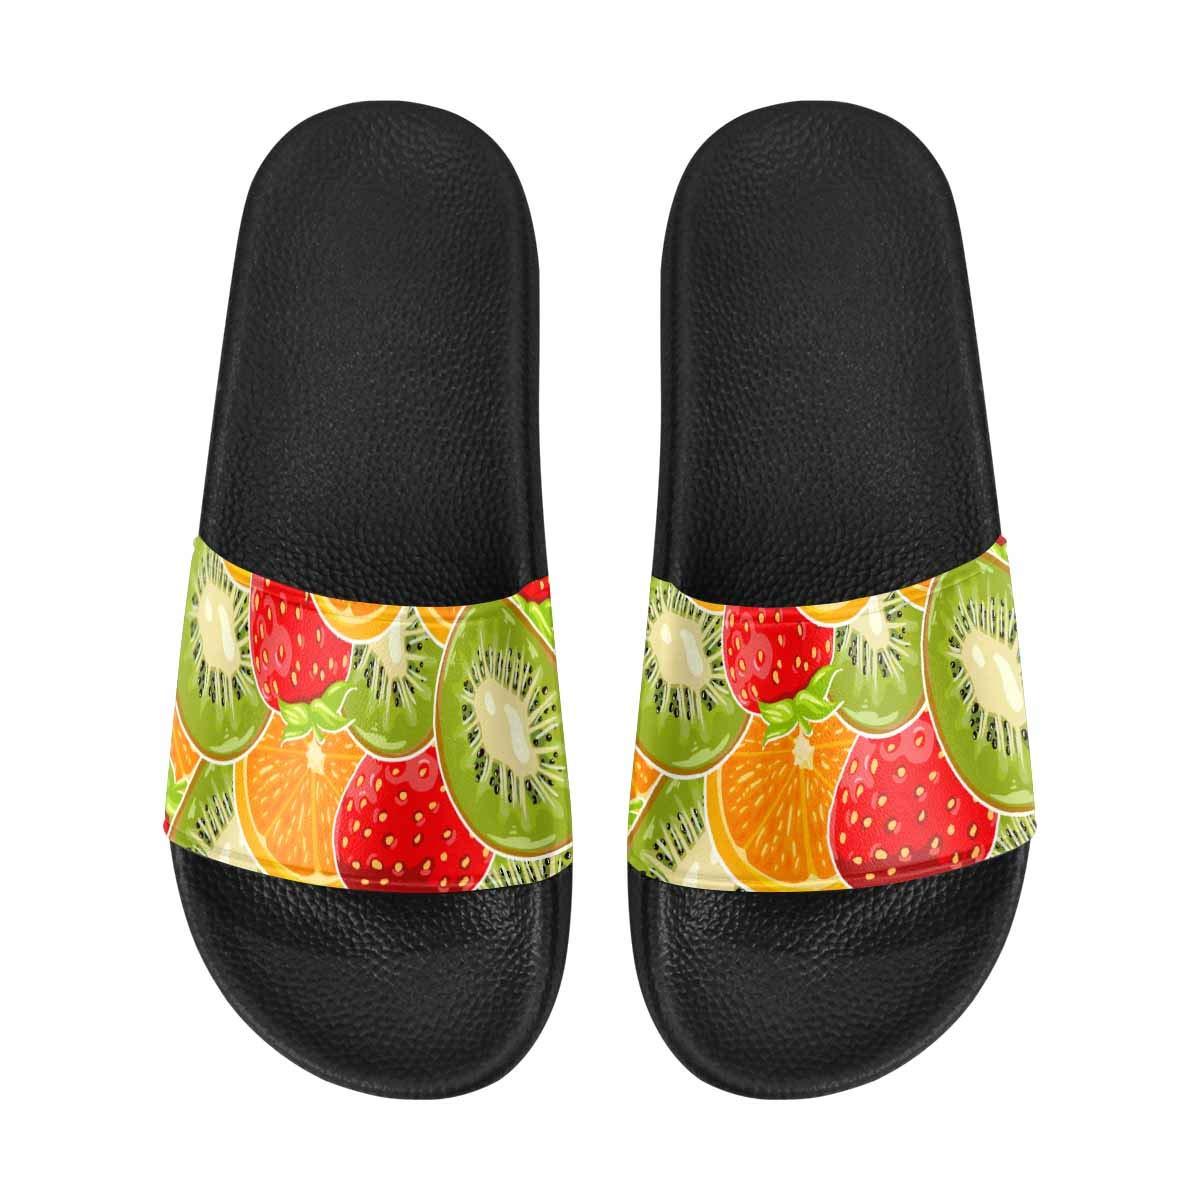 INTERESTPRINT Womens Lightweight Casual Style Slide Sandals US6-US12